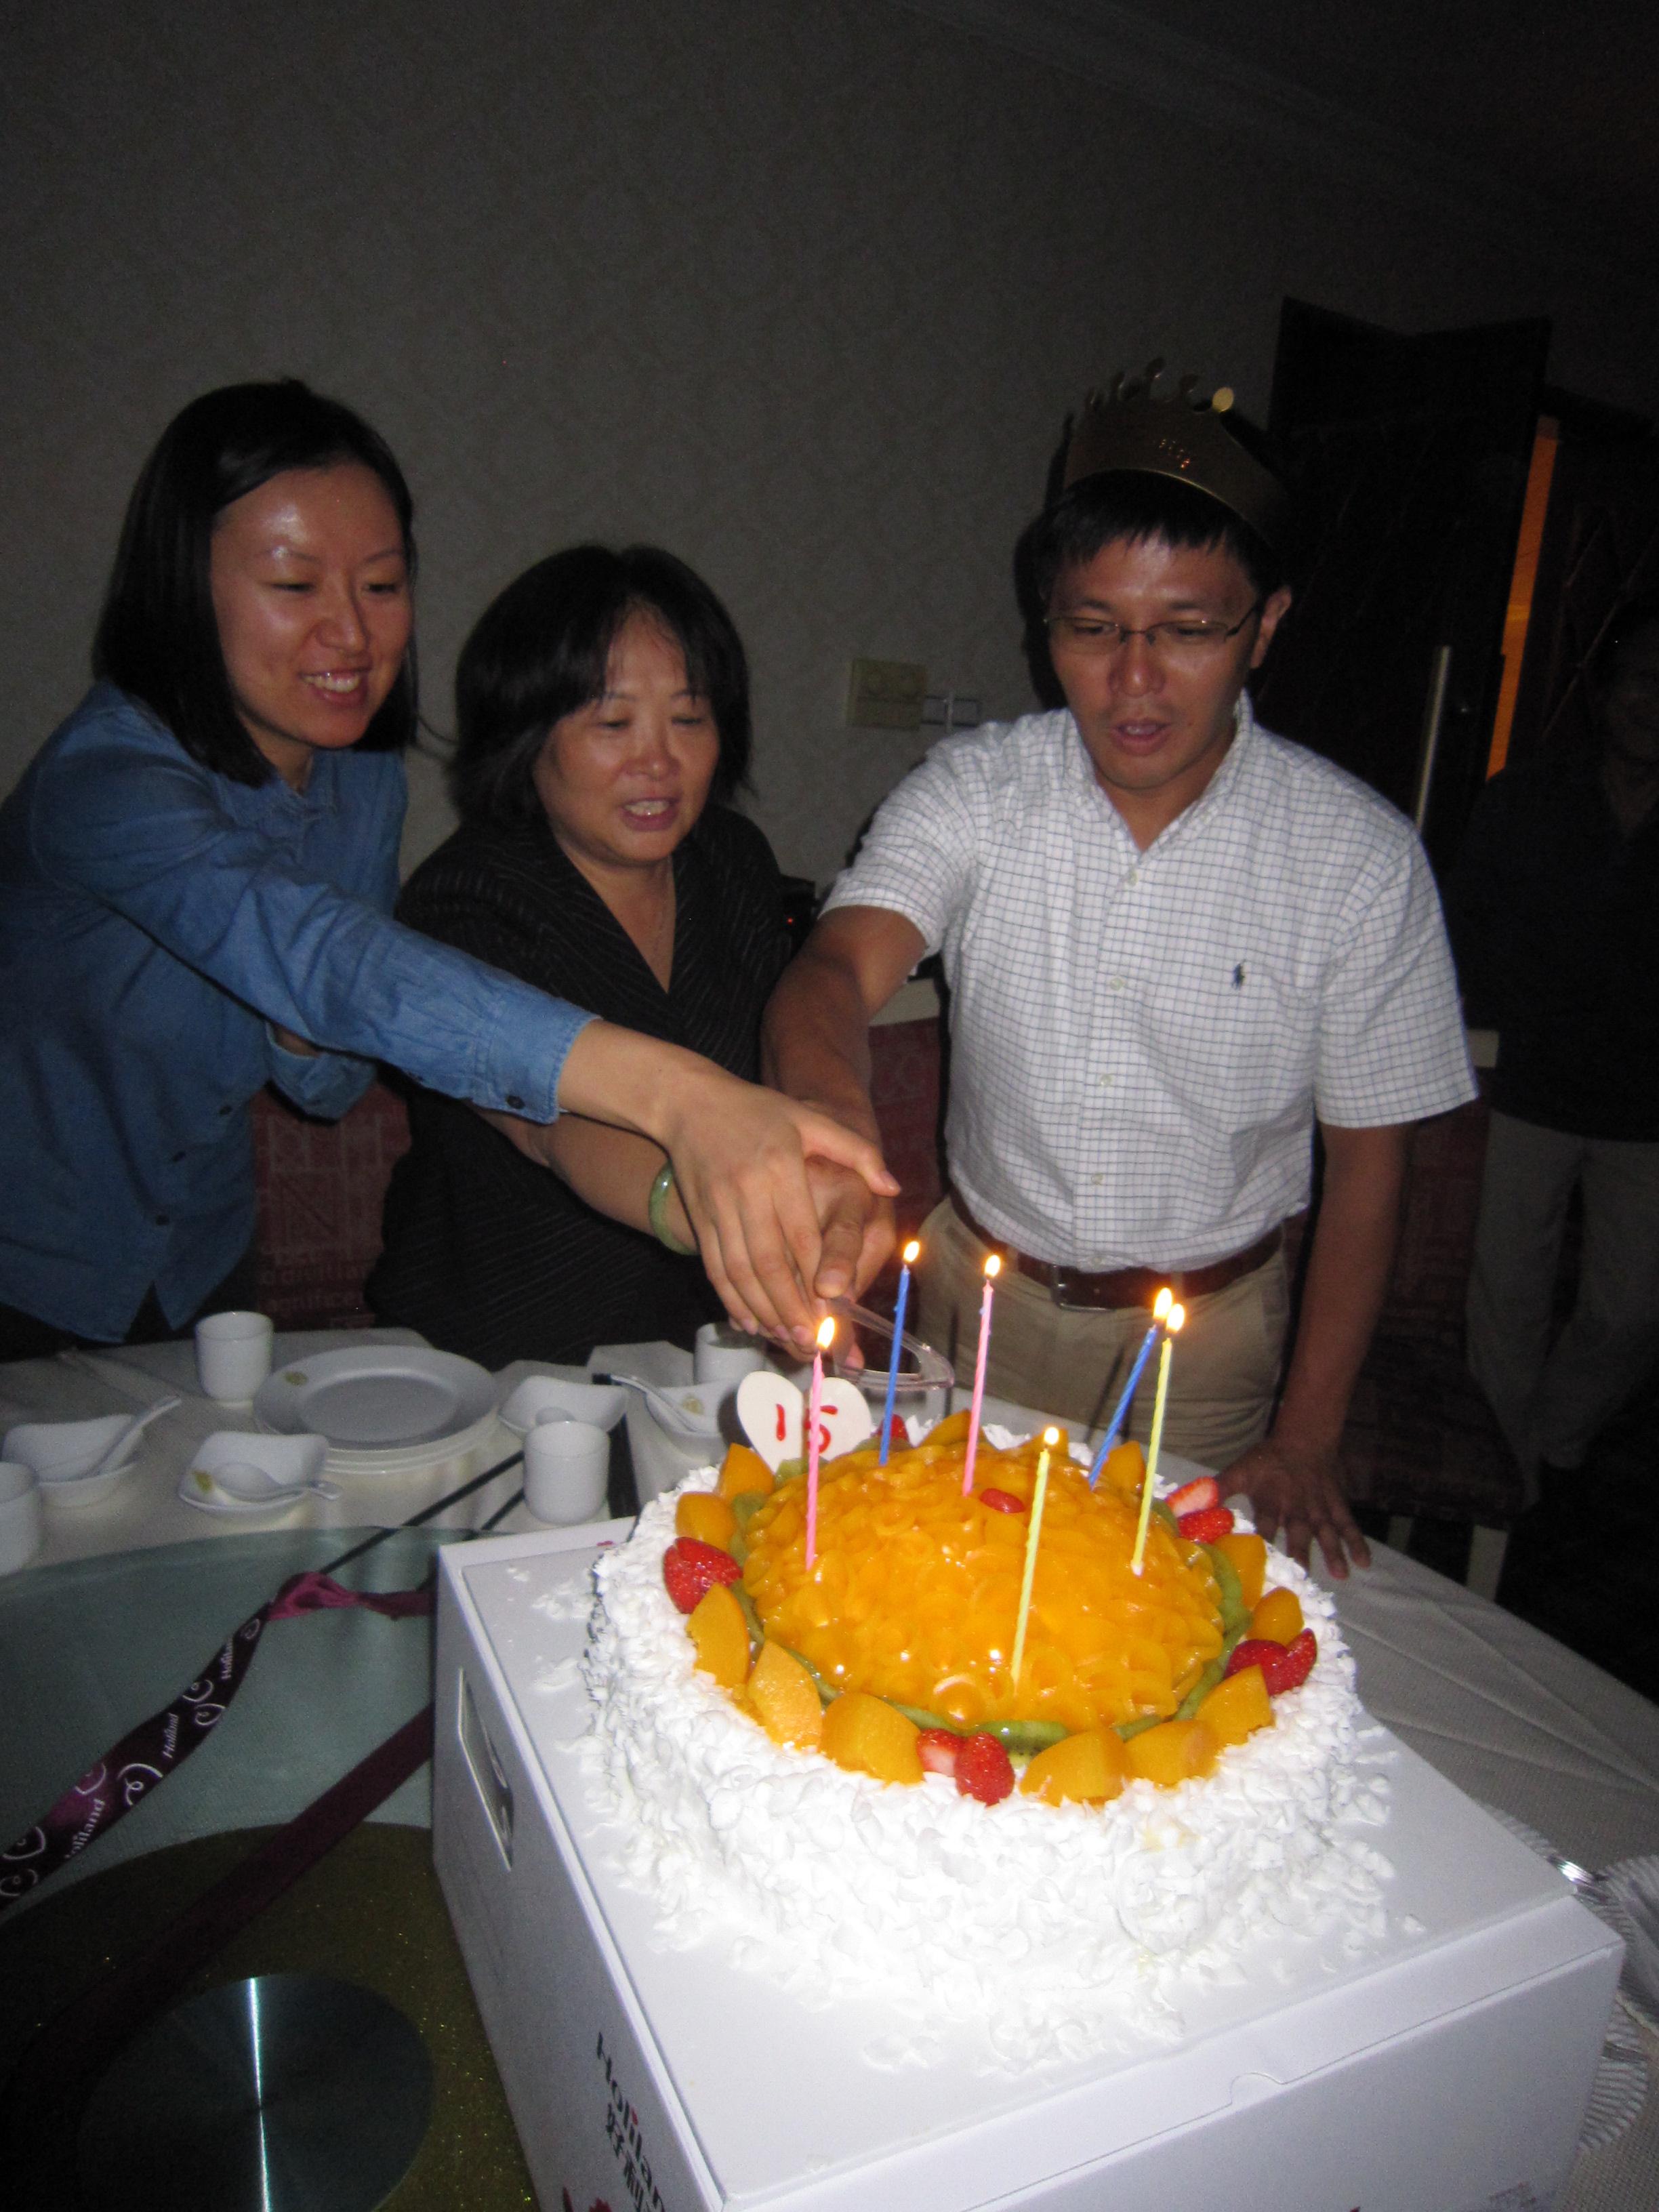 ENVIROASIA 15歳の誕生祝いにて 日・中・韓の代表者によるケーキ入刀